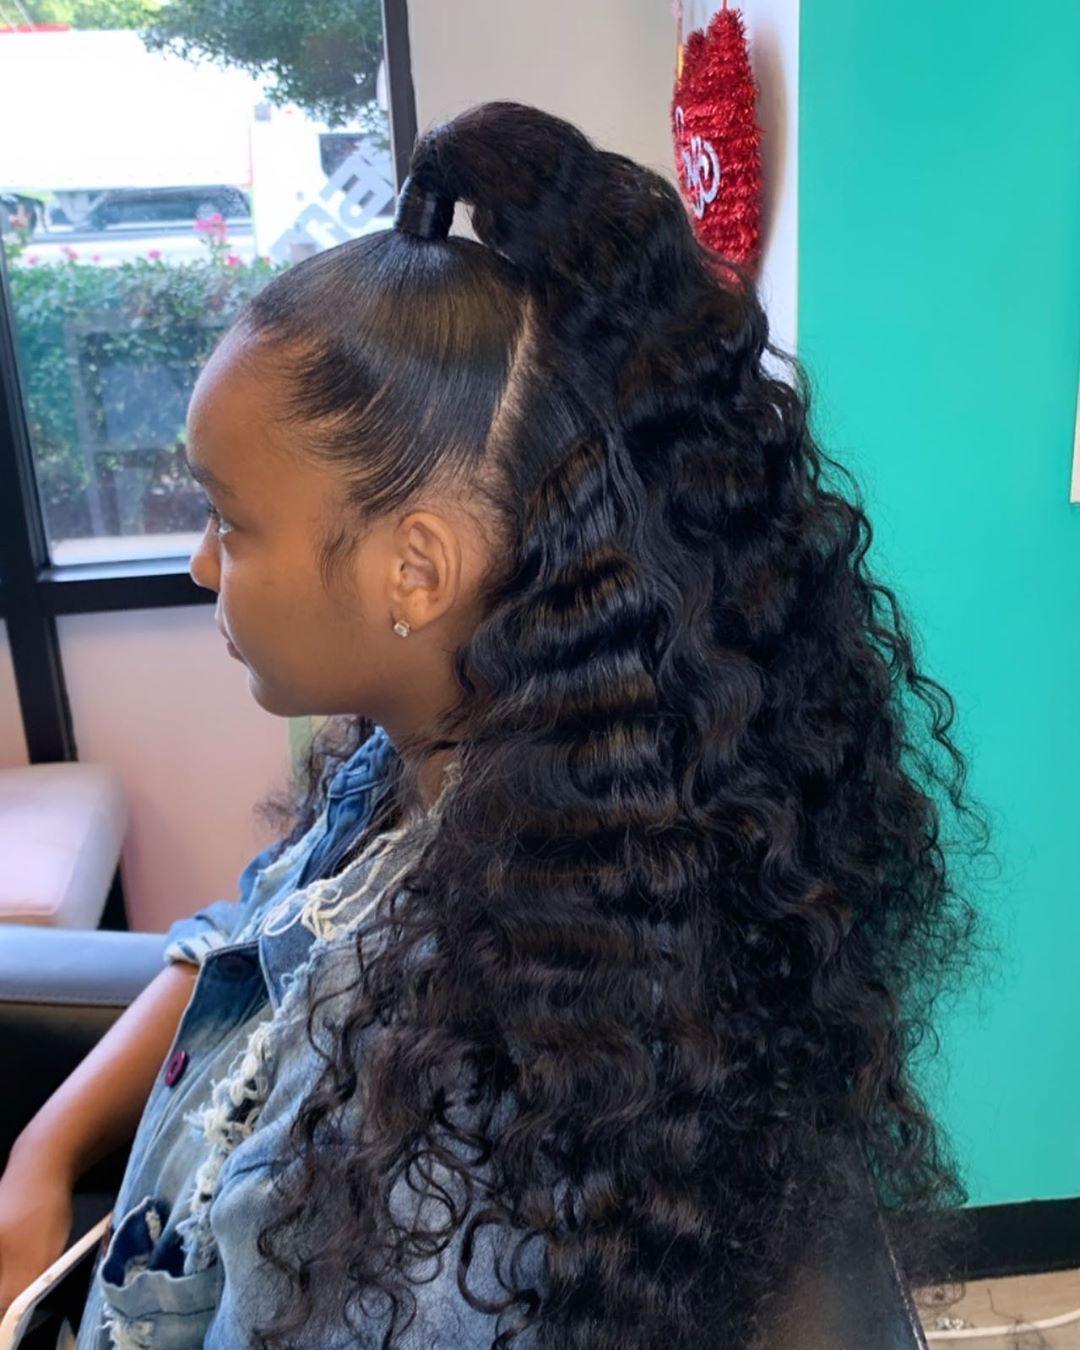 Hair By Jhade On Instagram Summer Trend Half Up Half Down Bob Hairbyjhade Bob Booknow Transitioning Hairstyles Bob Haircut Black Hair Hair Styles